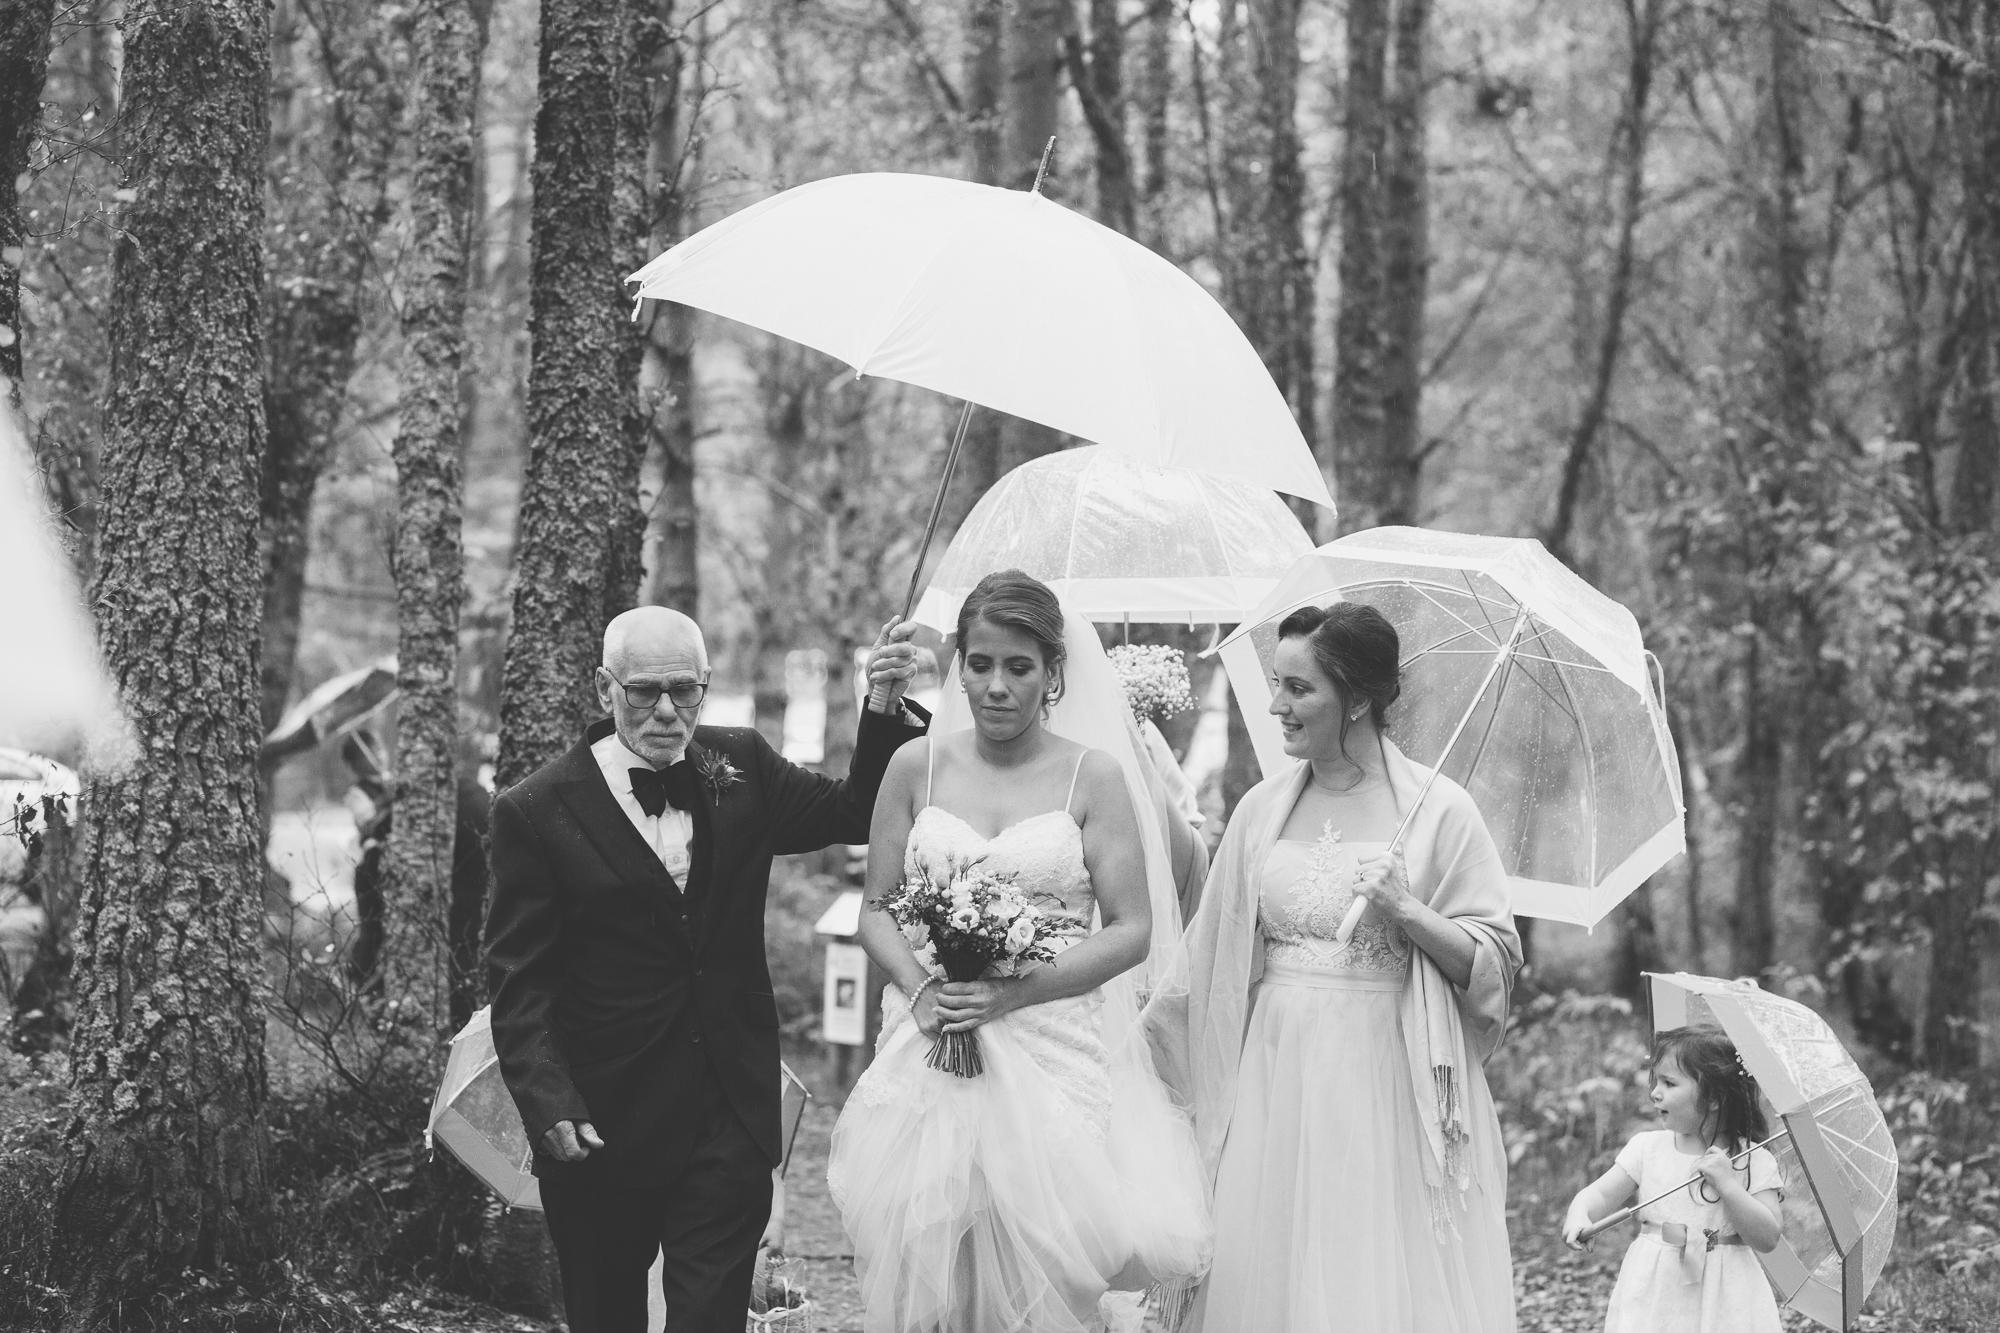 weddingphotographeraberdeen (3 of 5).jpg